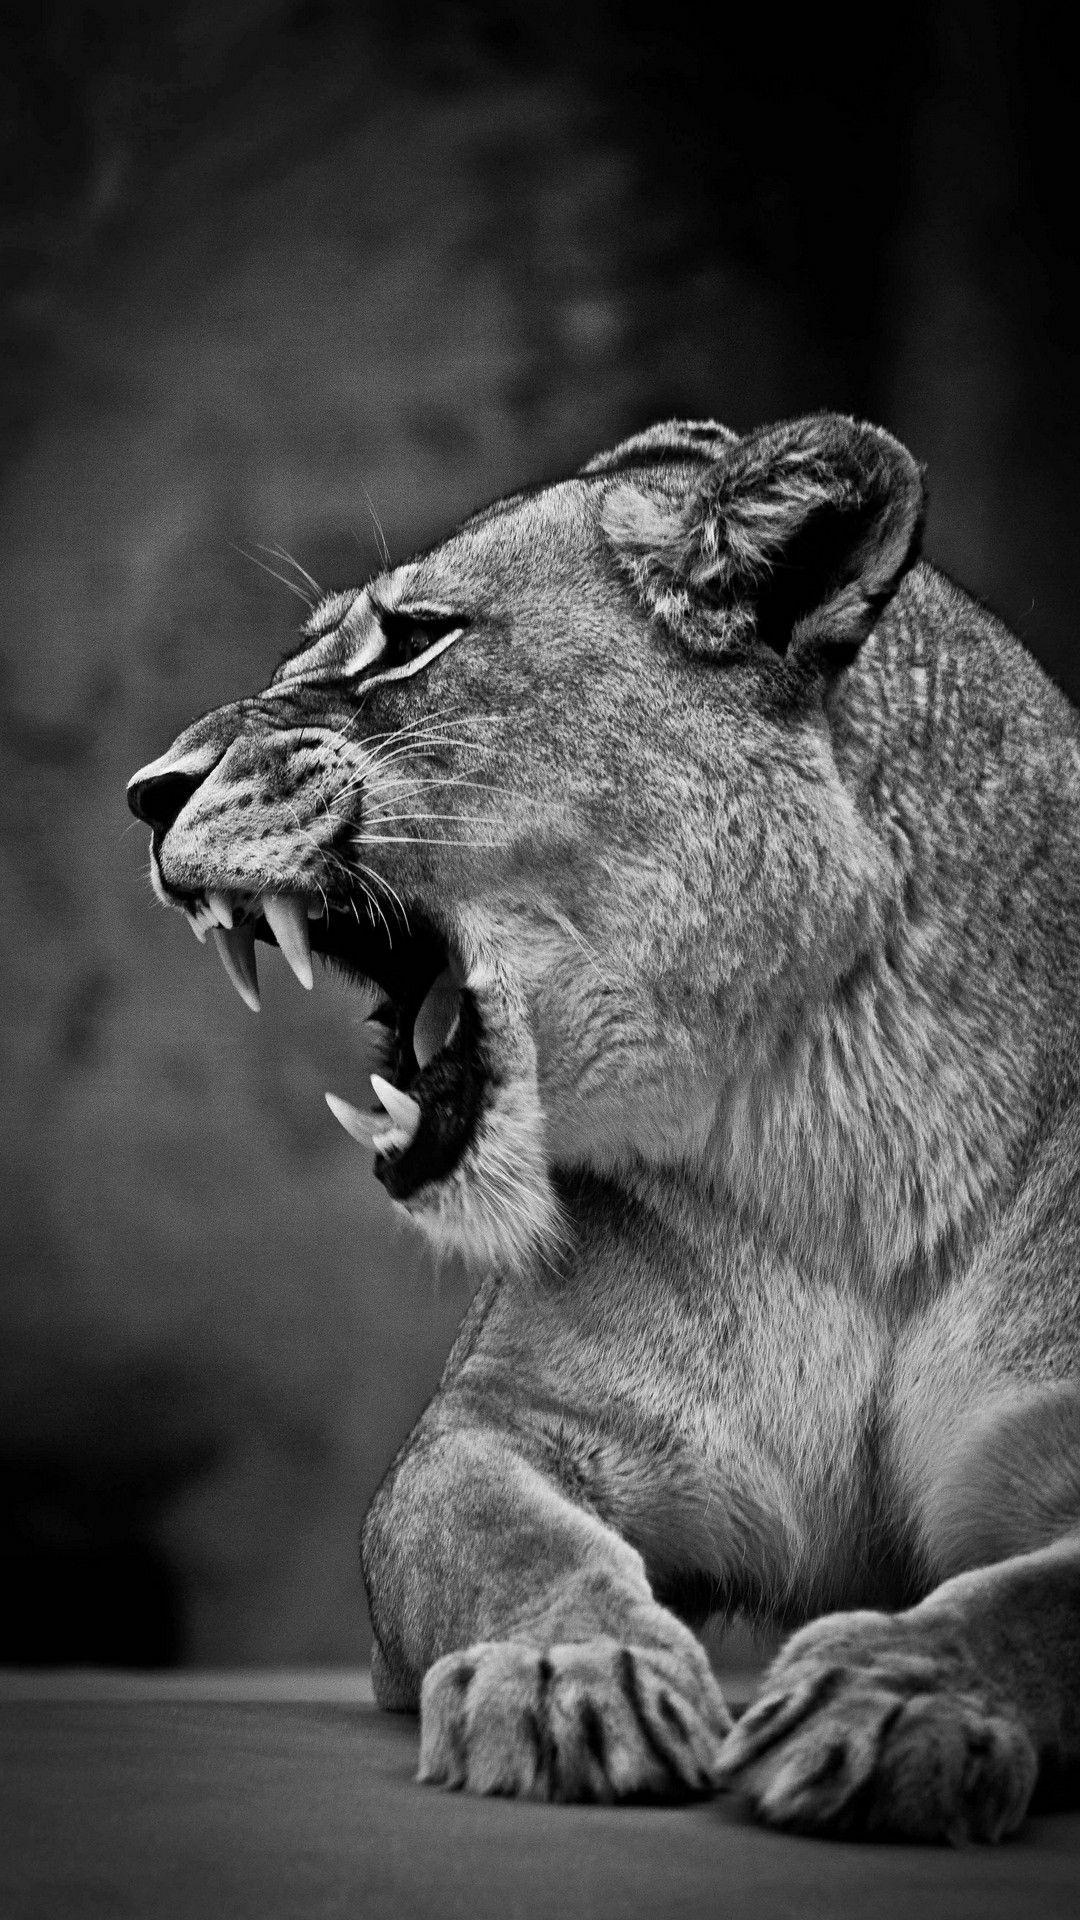 Lioness Wallpaper Animales Animales Majestuosos Stuffed